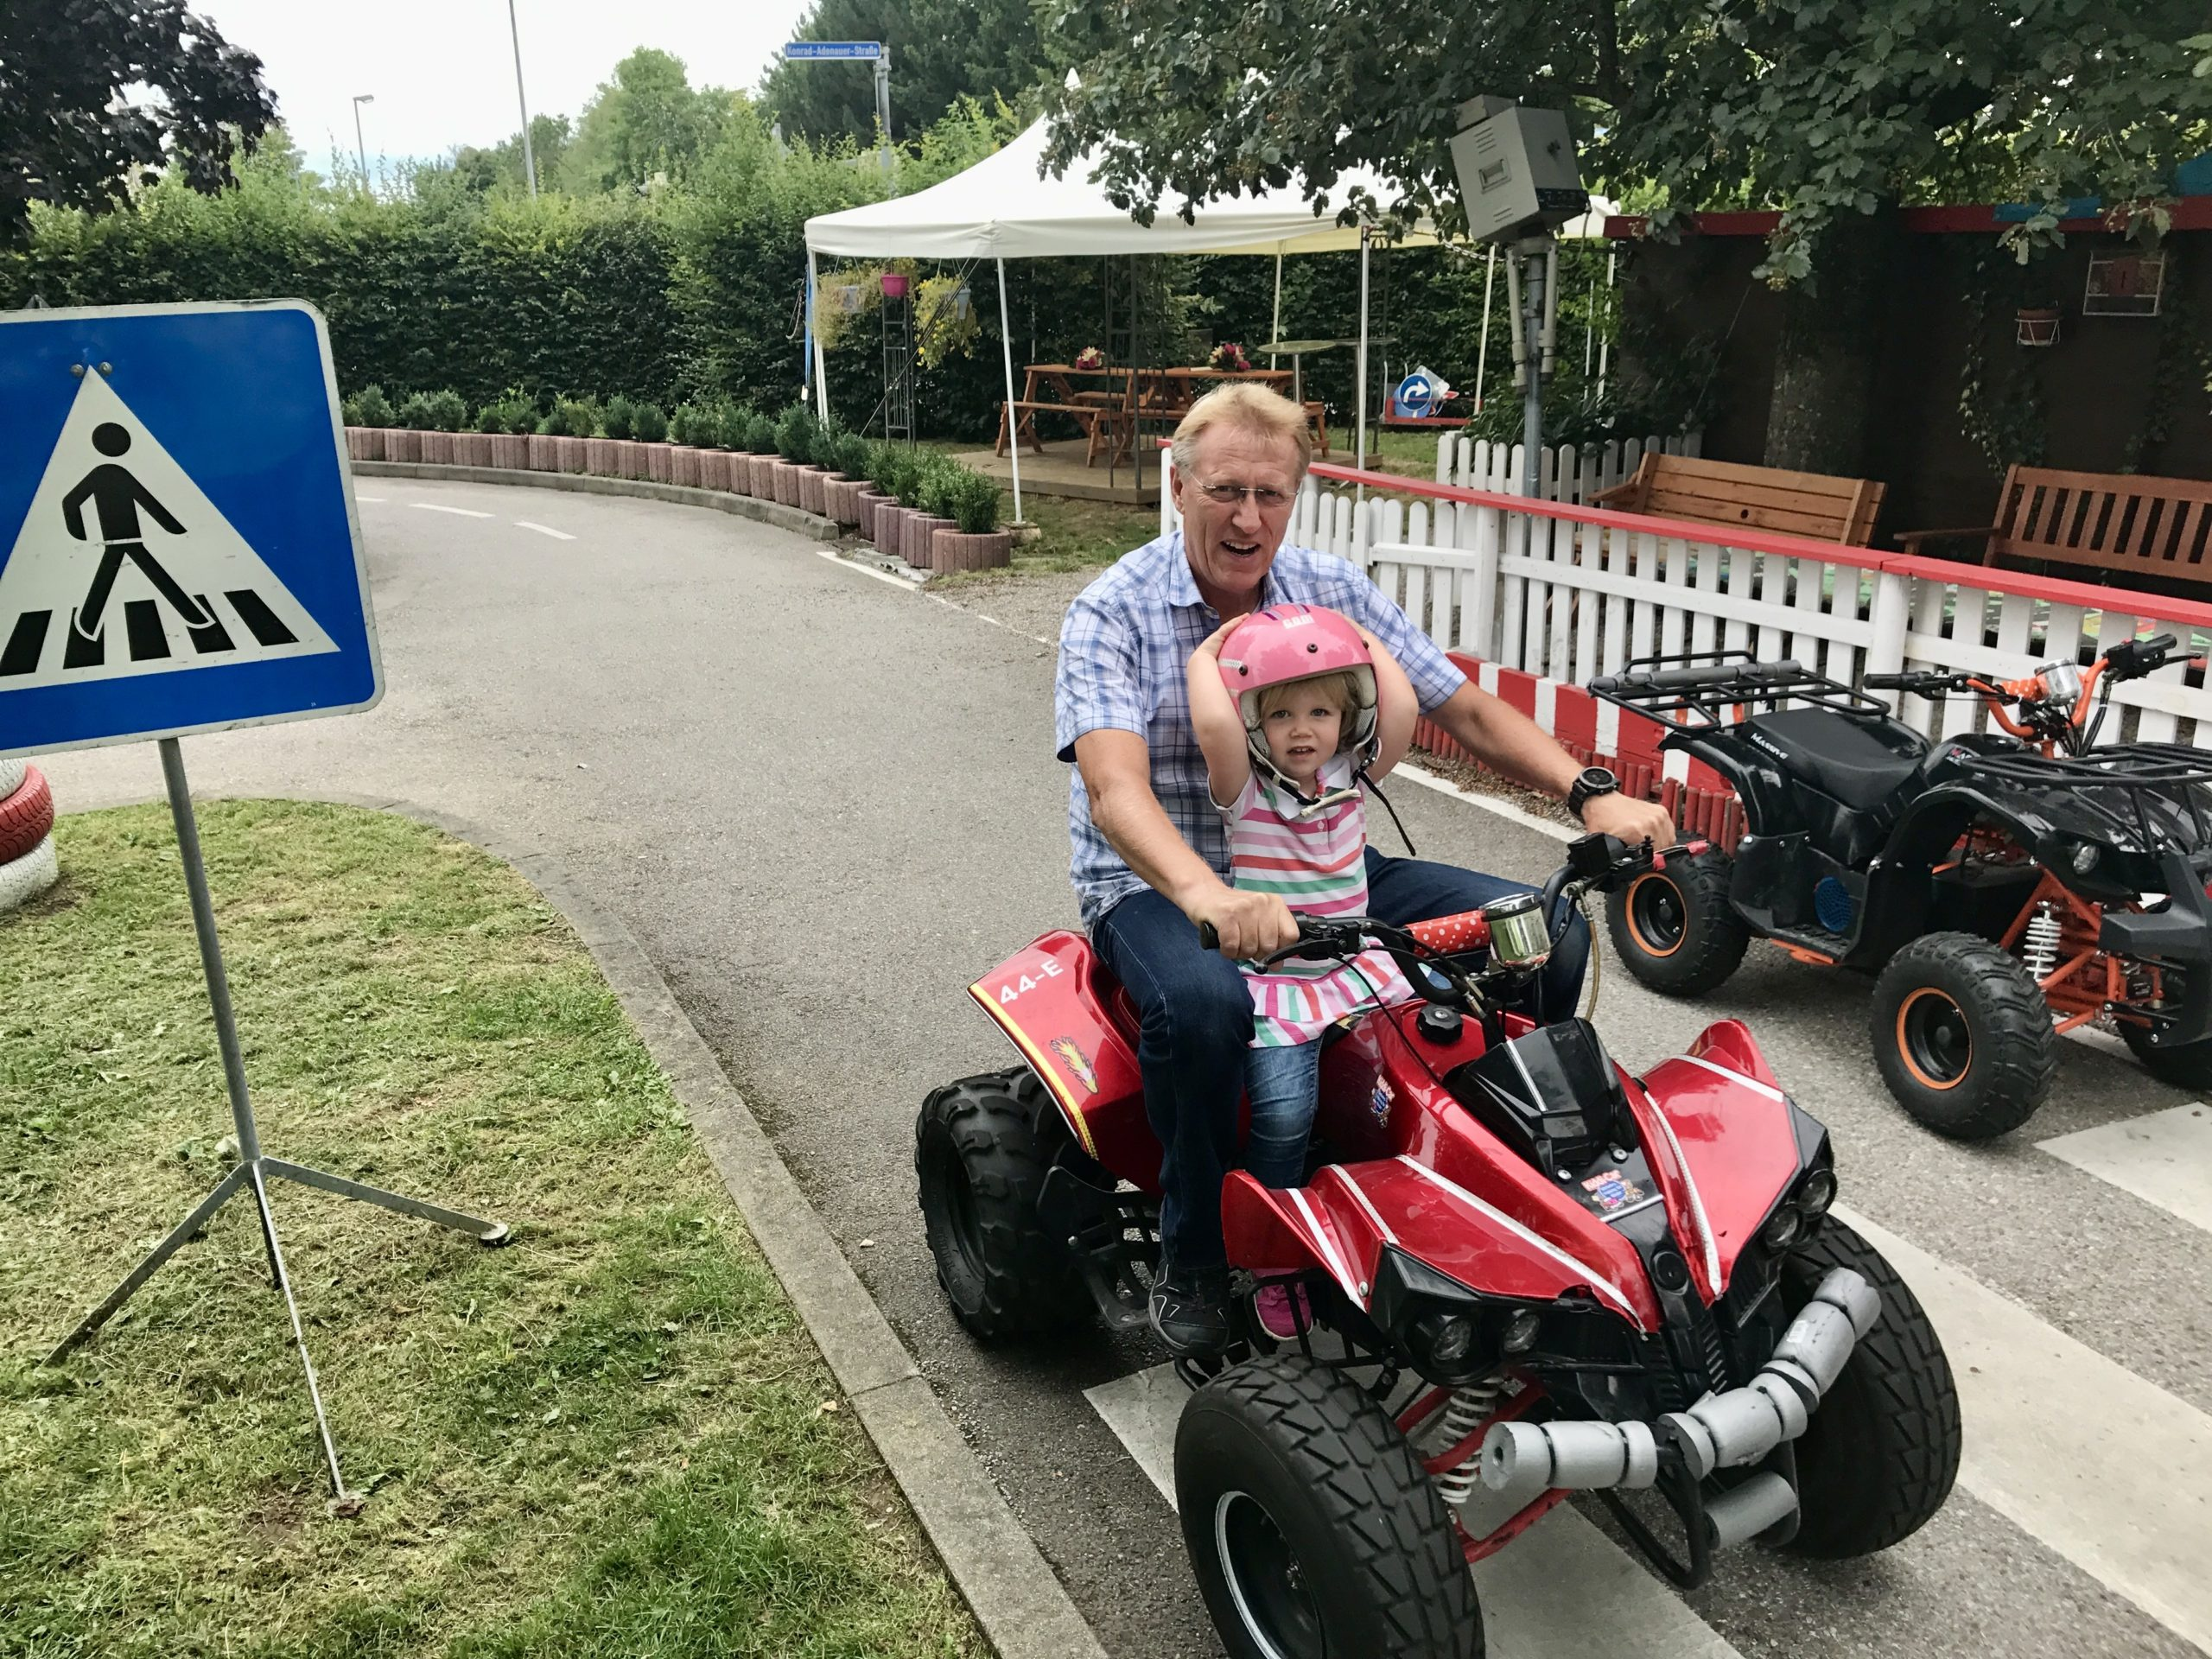 Kiddi-Car Quadfahren Opa und Enkelin auf Quad bei Kiddi Car scaled